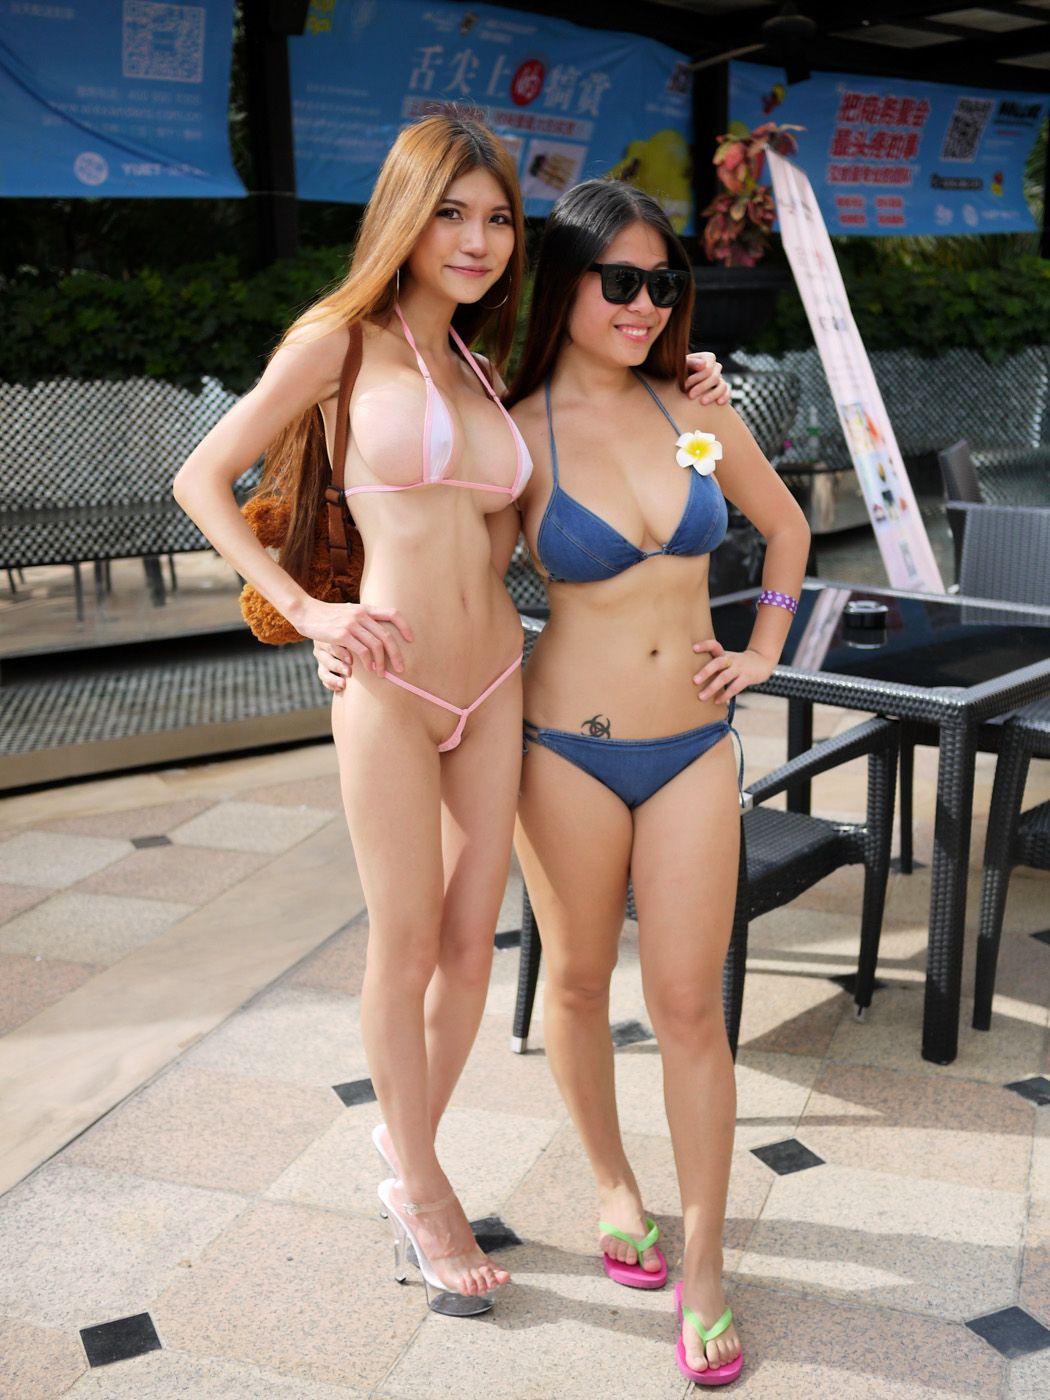 Pool Party 2015 - Album on Imgur | Bikini suit, Bikinis